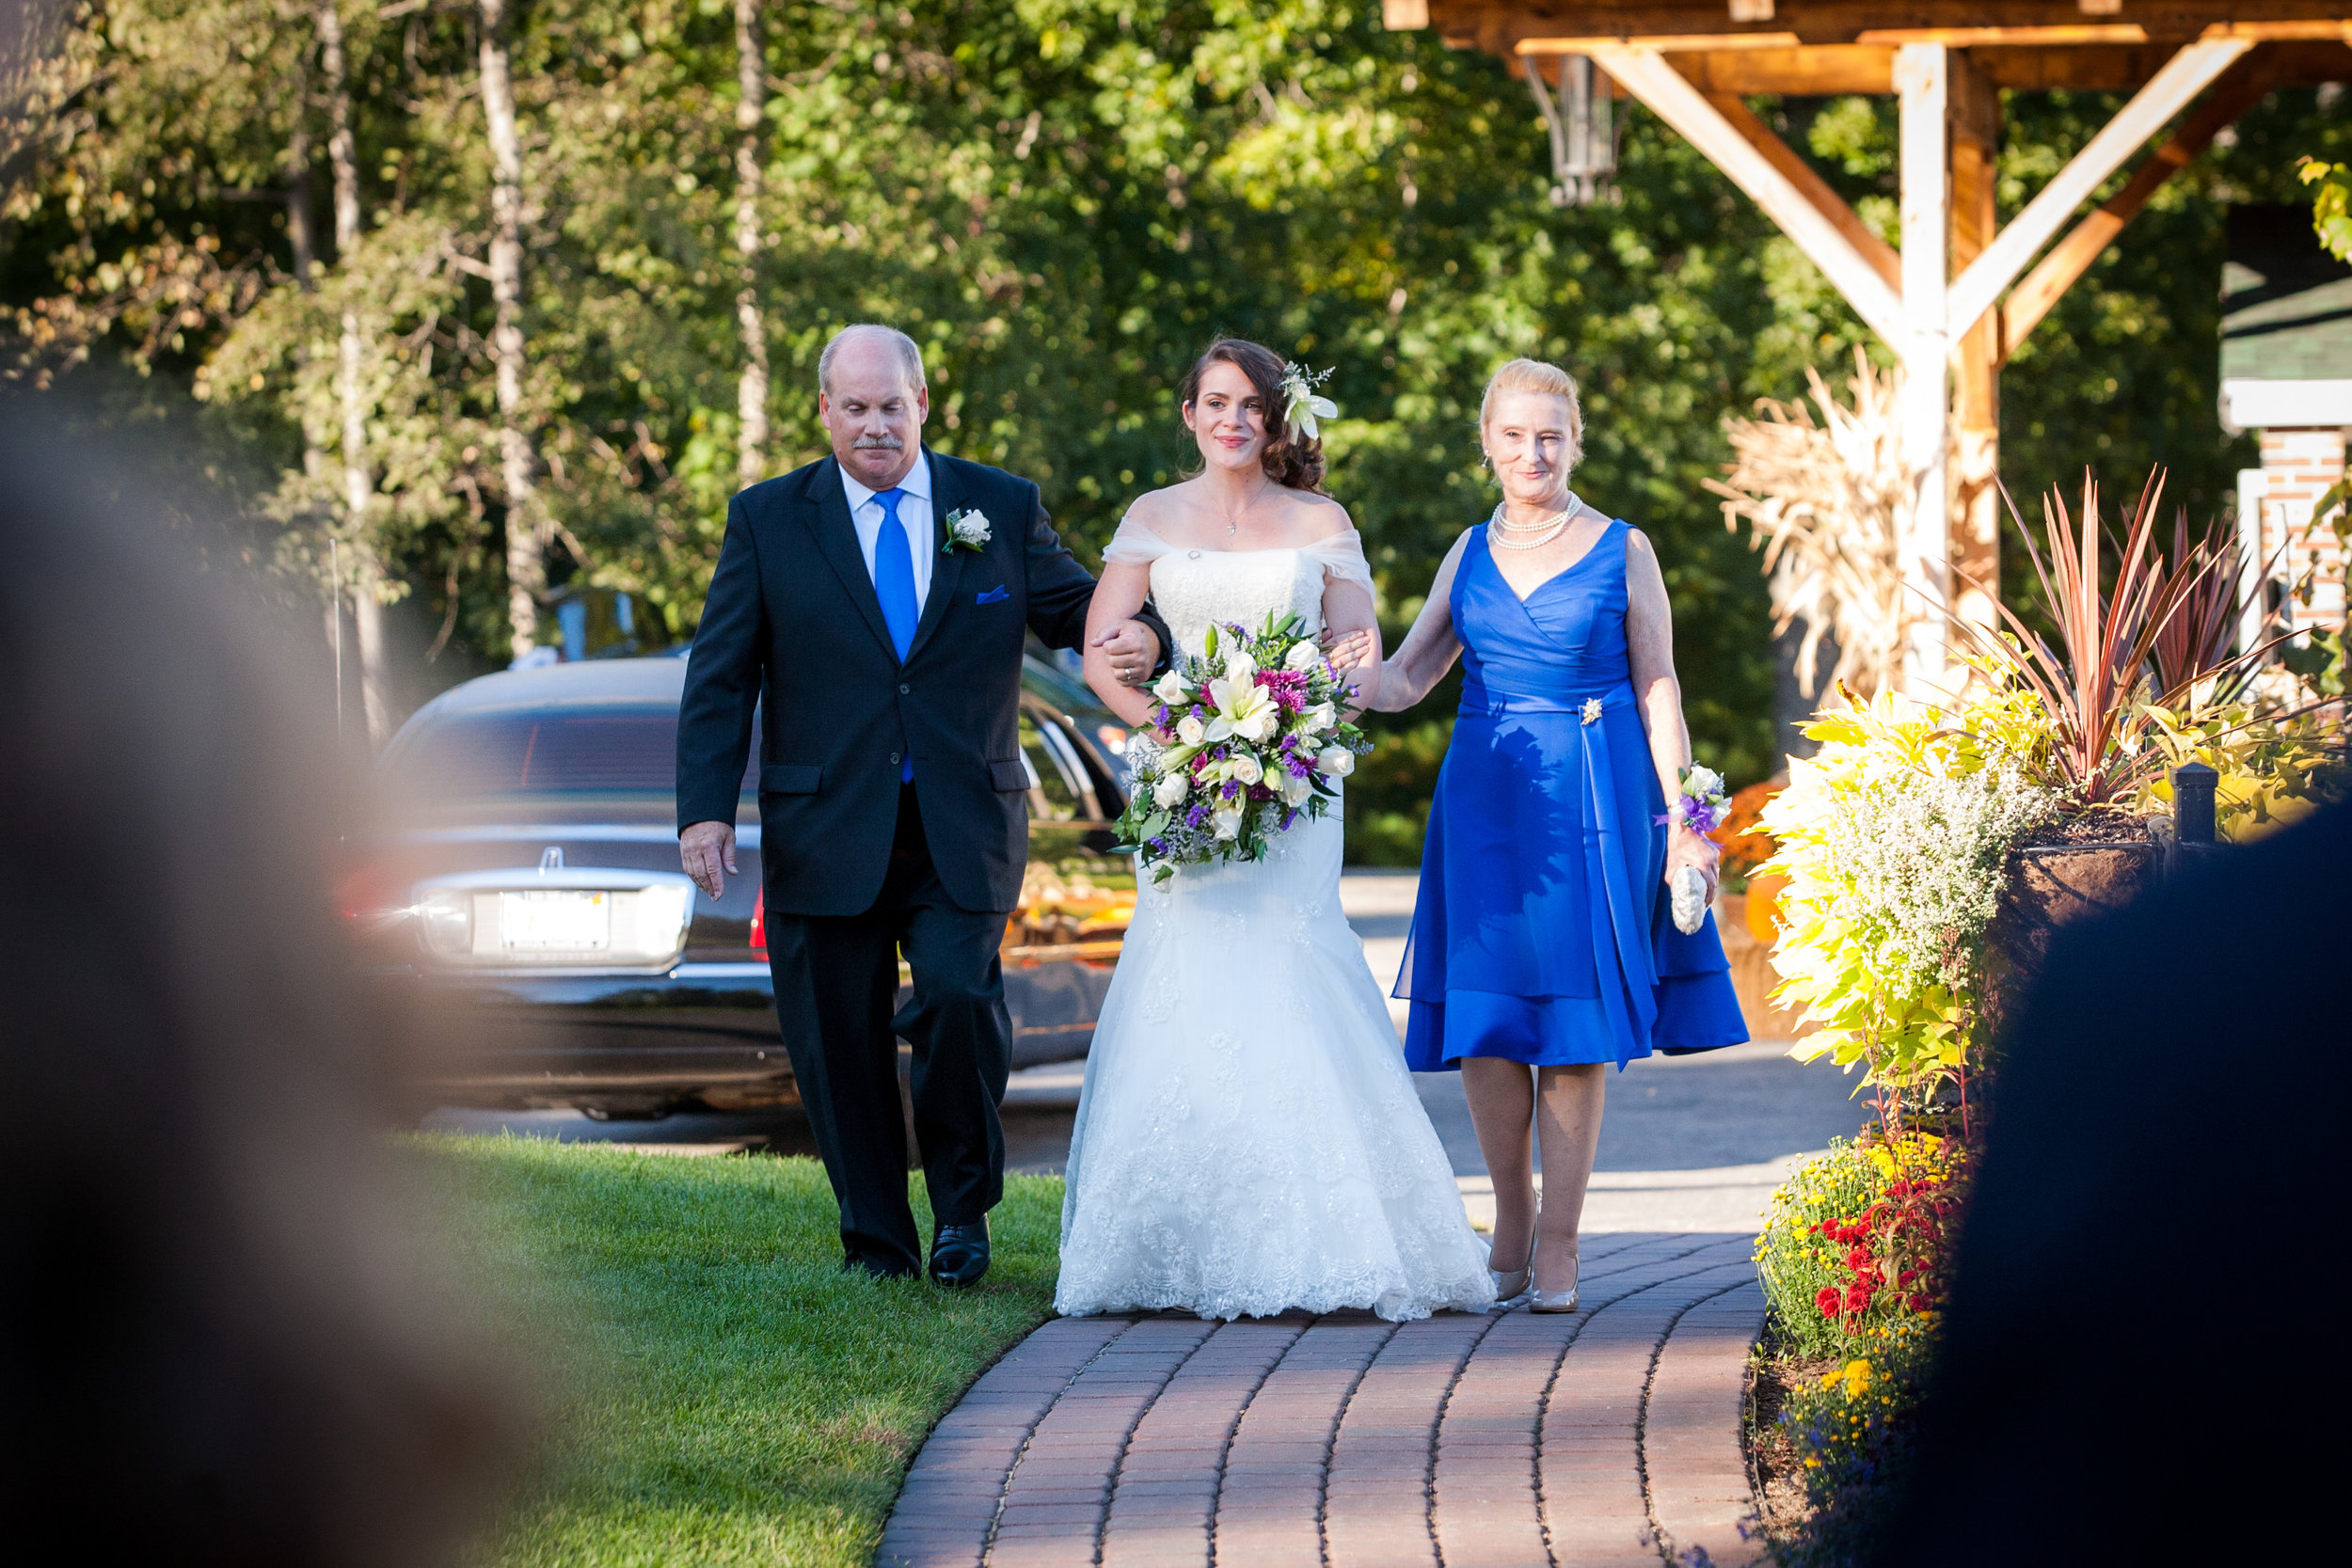 zorvino_sandown_NH_wedding_photography-45.jpg